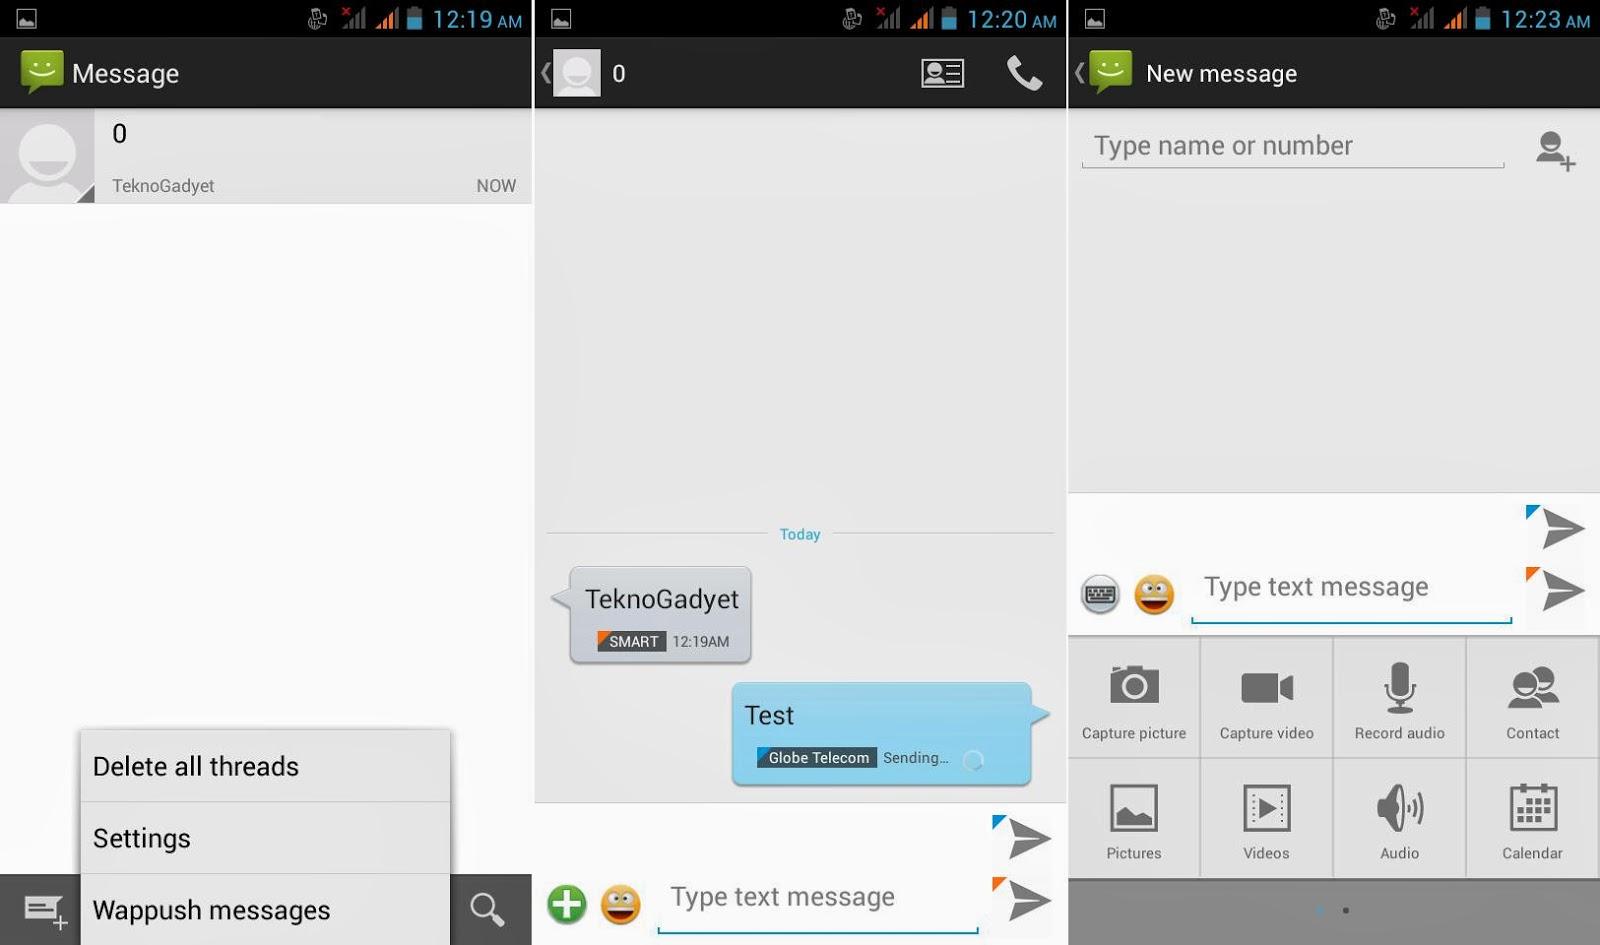 DTC Mobile GT15 Astroid Fiesta Messaging